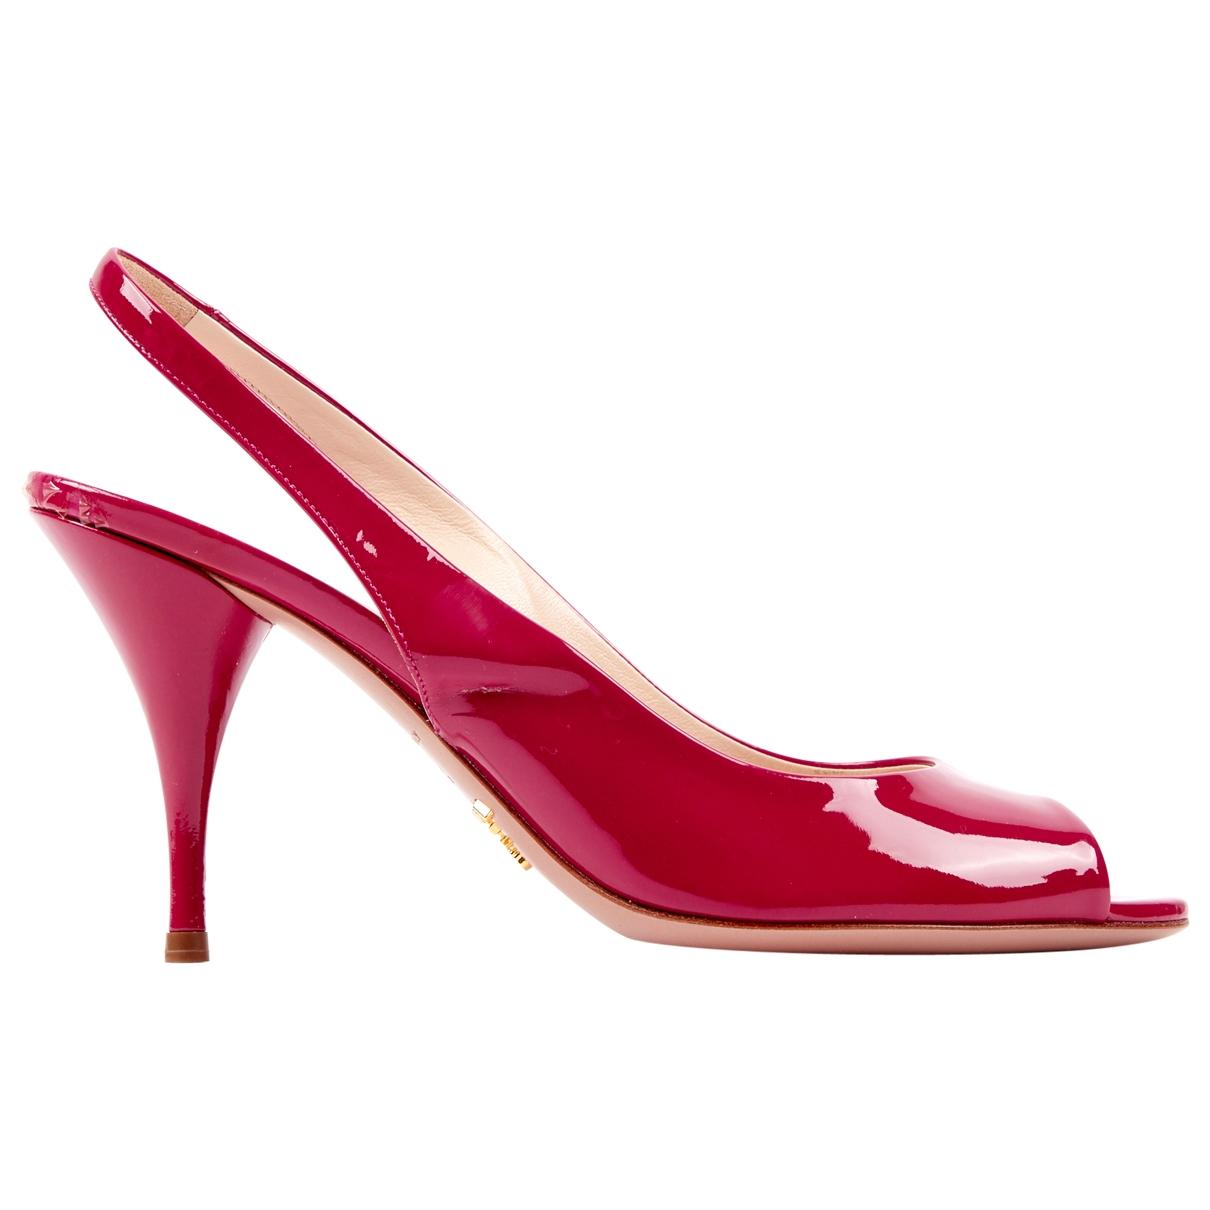 Prada \N Red Patent leather Heels for Women 37.5 EU